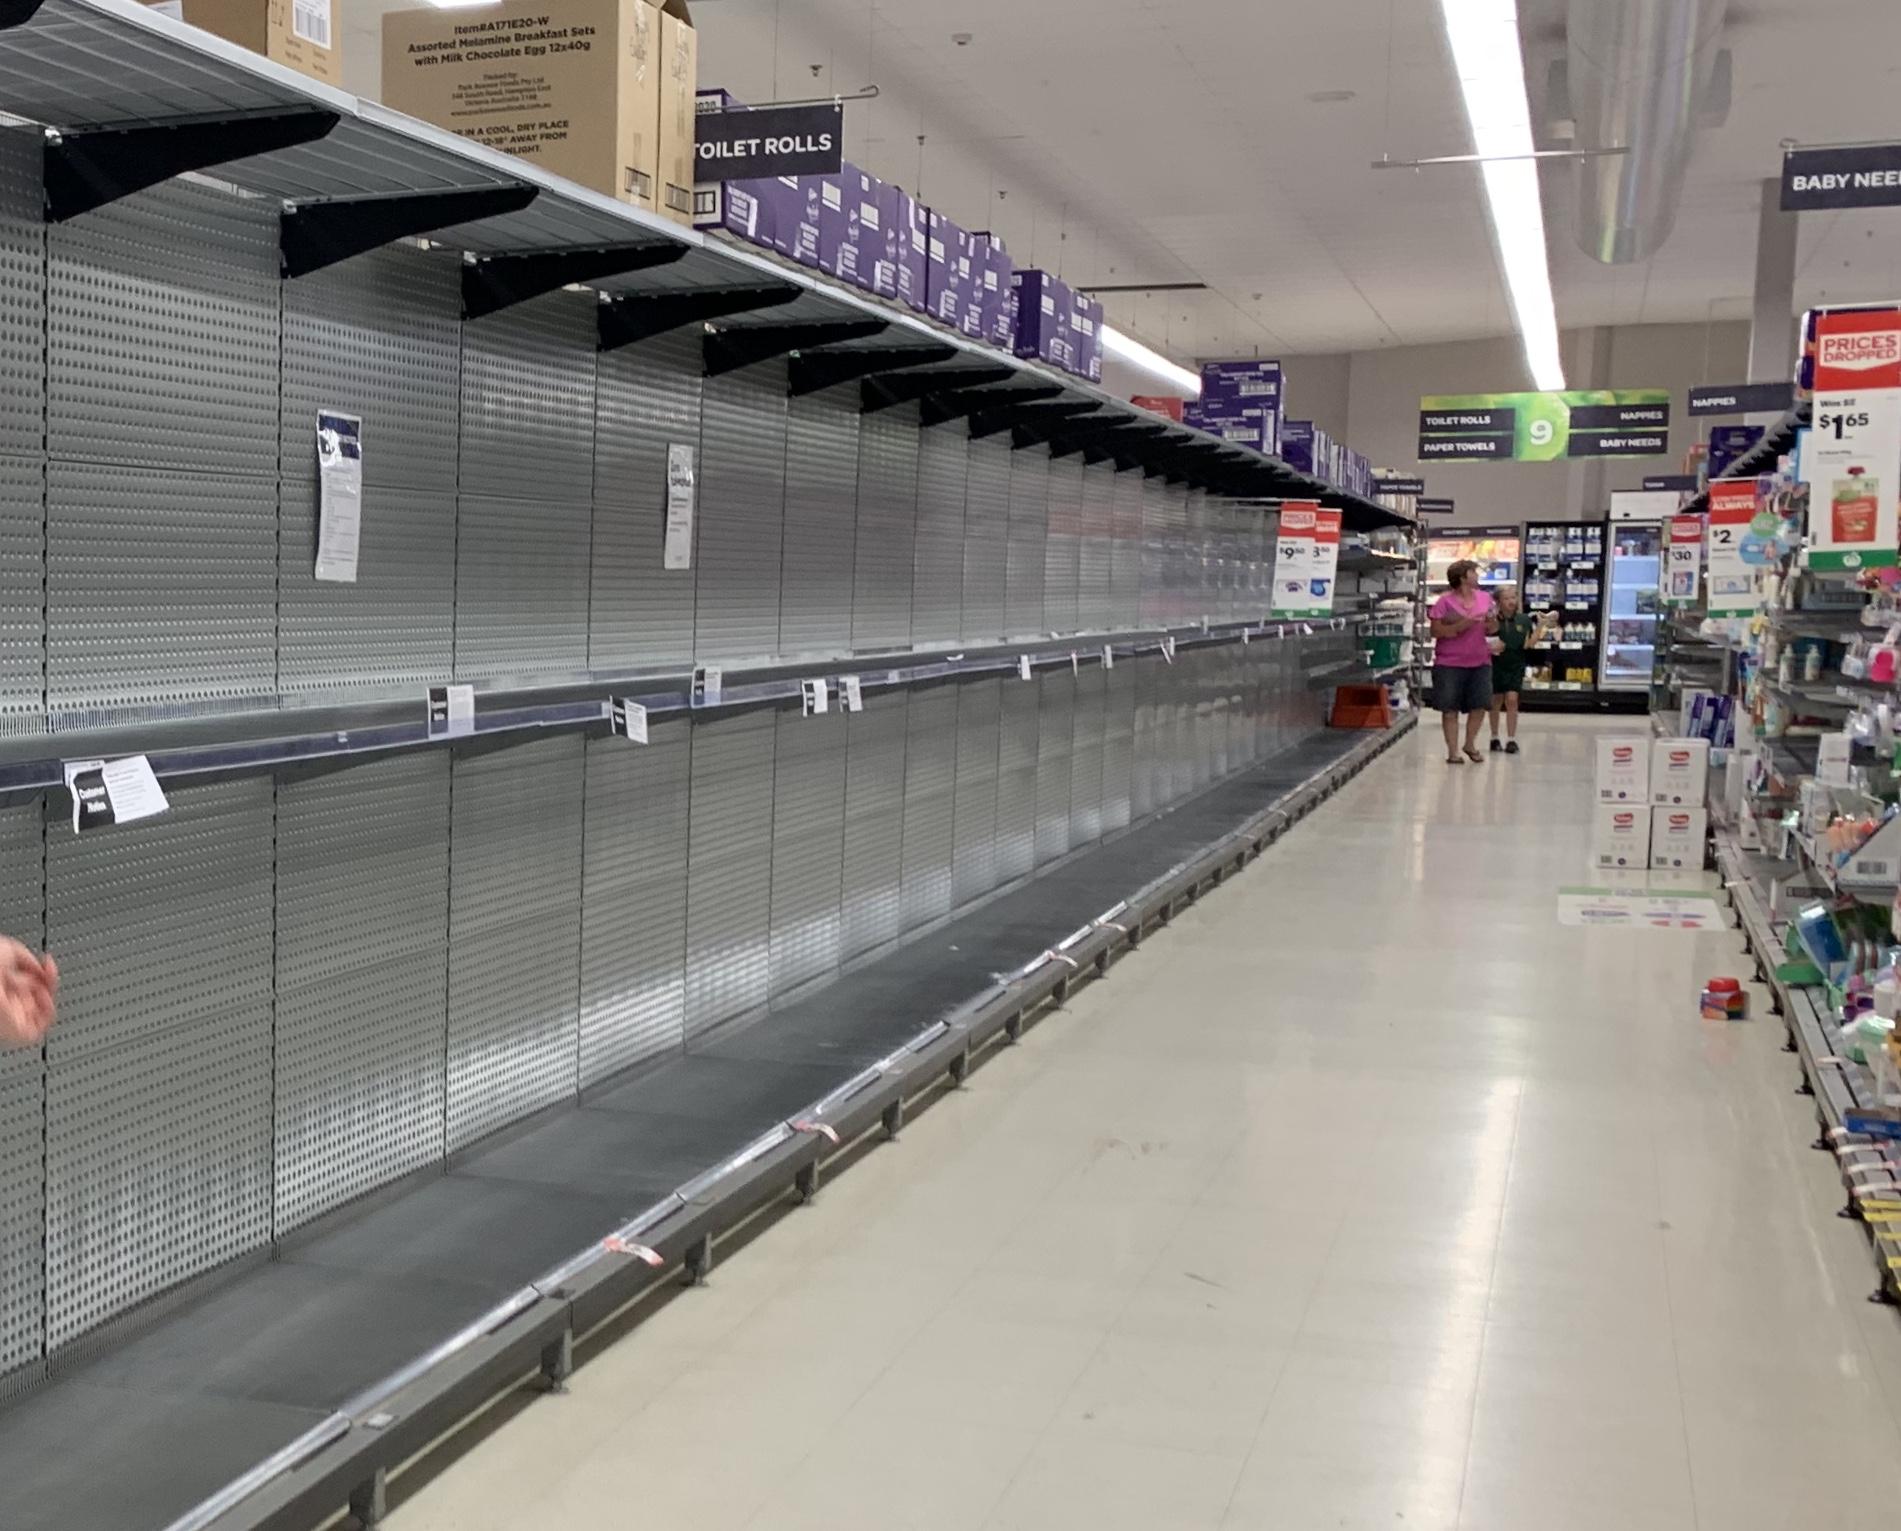 Australian toilet paper shortage due to Coronavirus